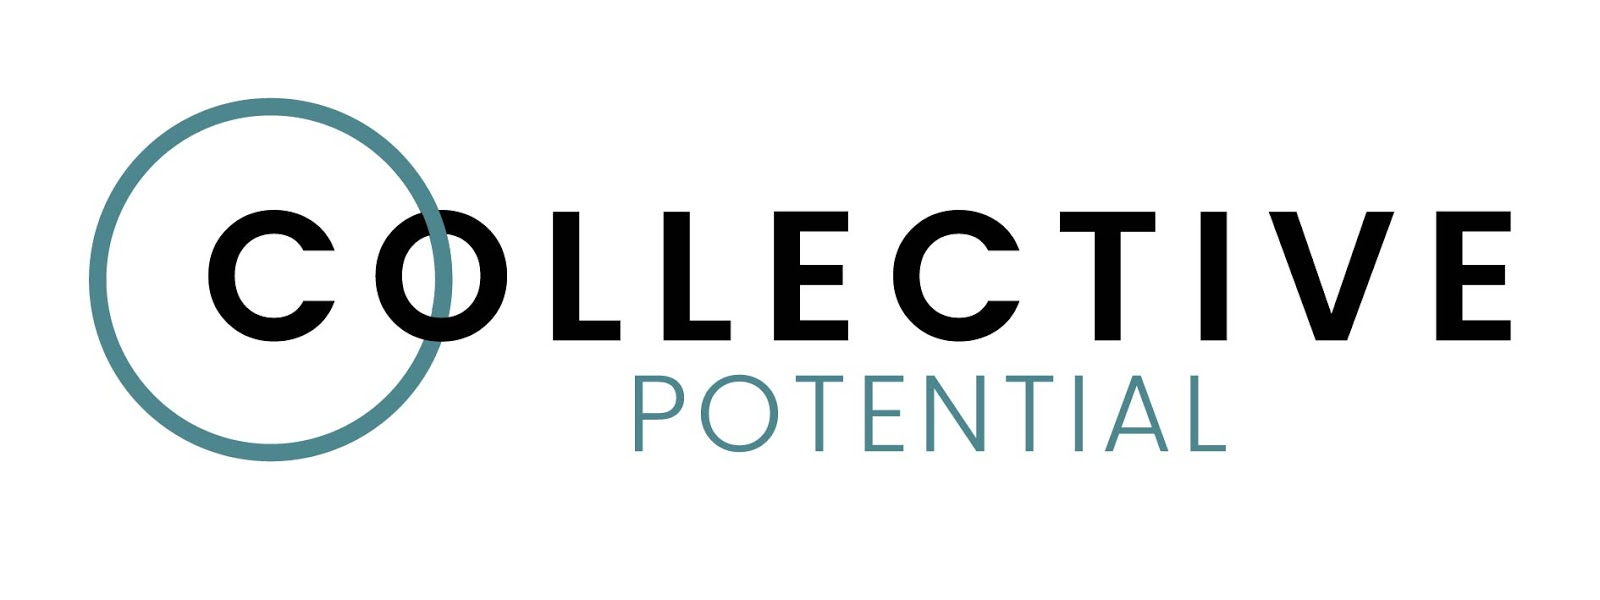 Collective Potential Logo